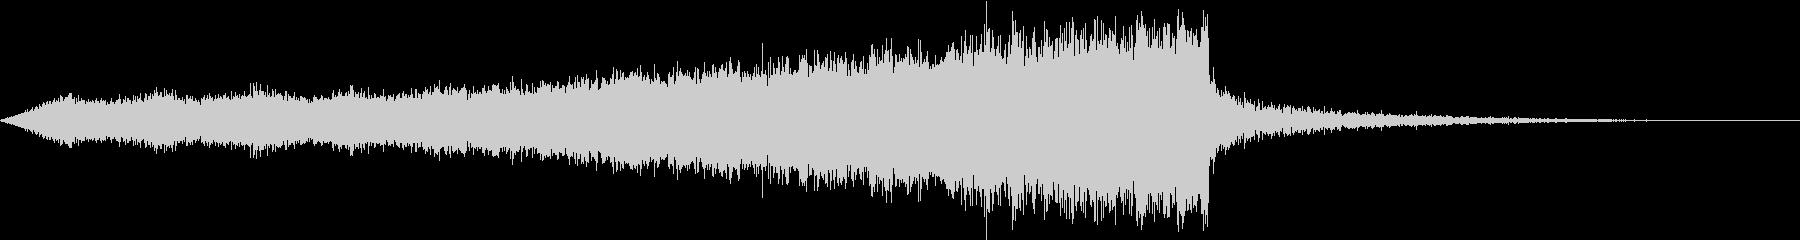 CINEMATIC RISER_24の未再生の波形